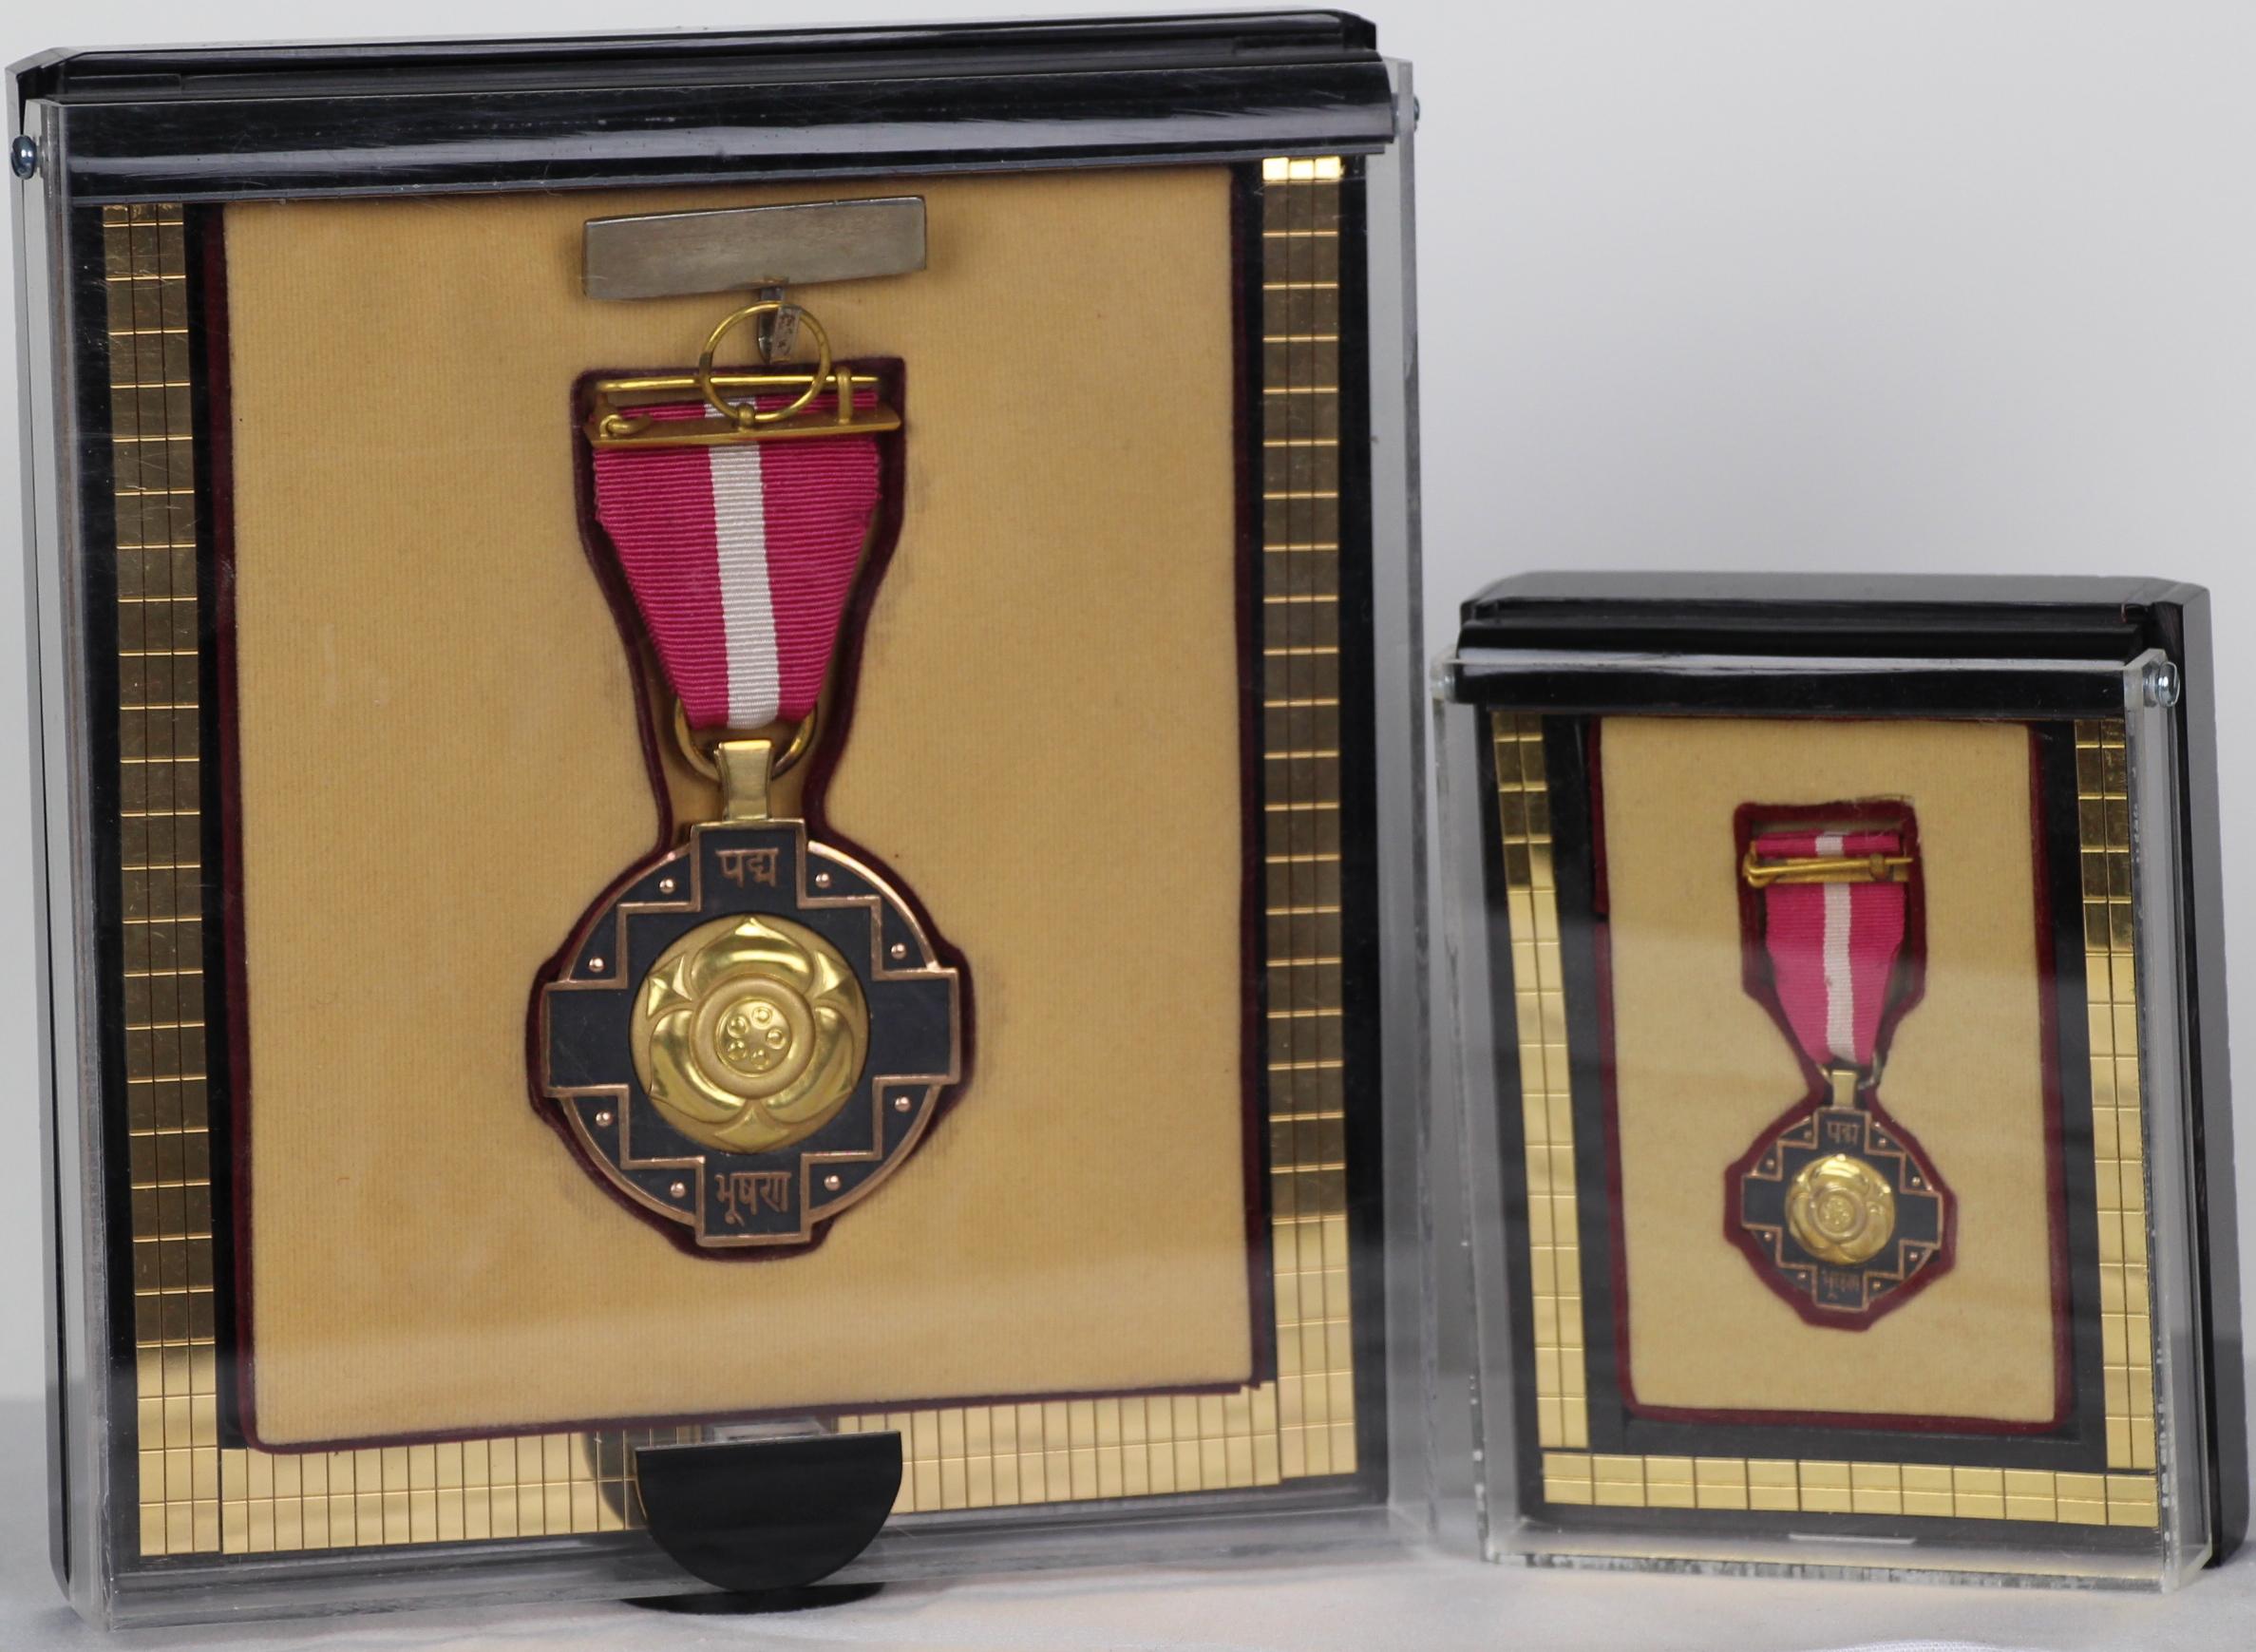 Padma Bhushan Award, Government of India, 2009